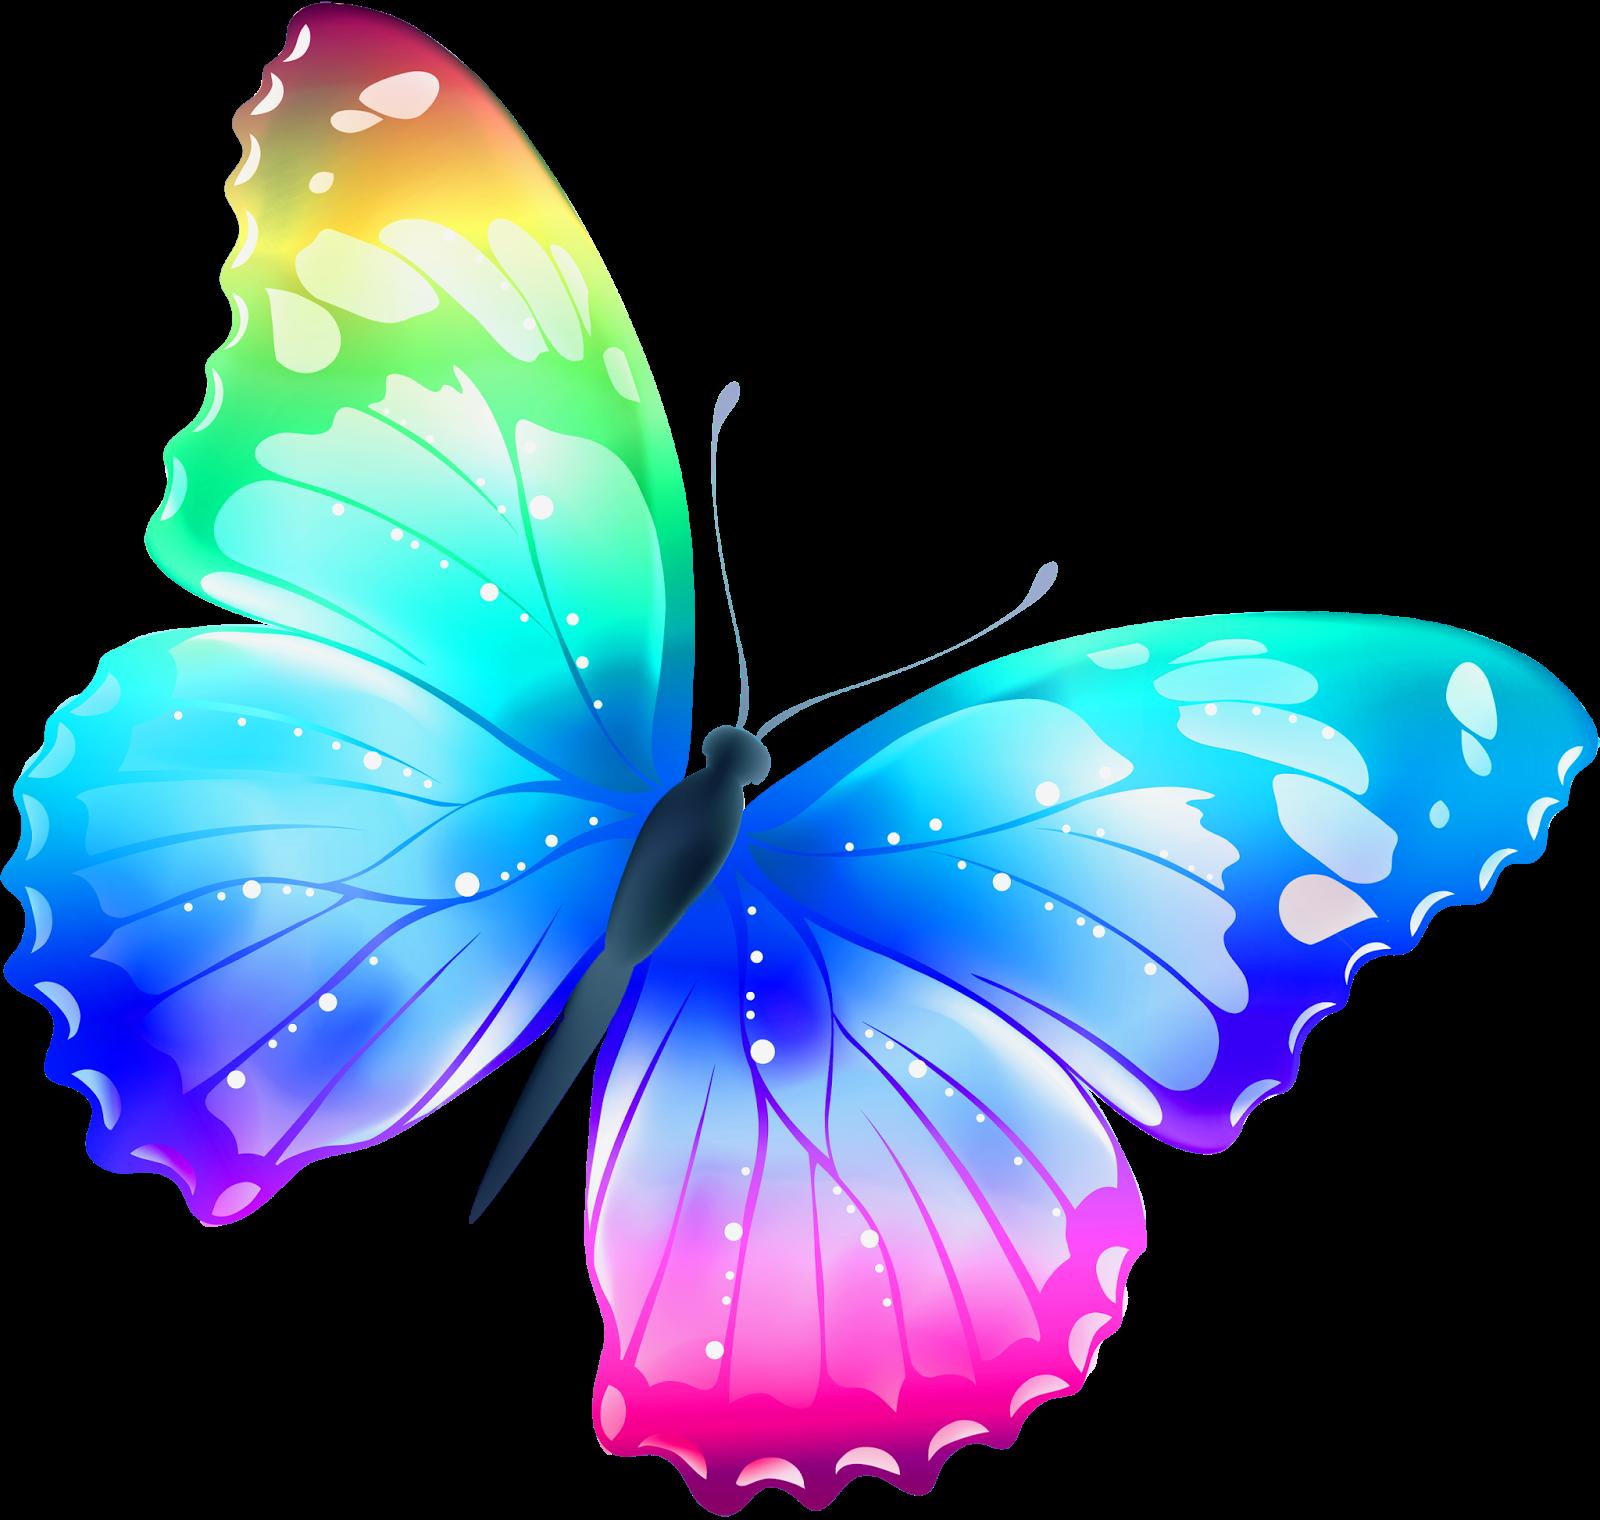 Imagenes bellisimas 3 Large_Transparent_Multi_Color_Butterfly_PNG_Clipart